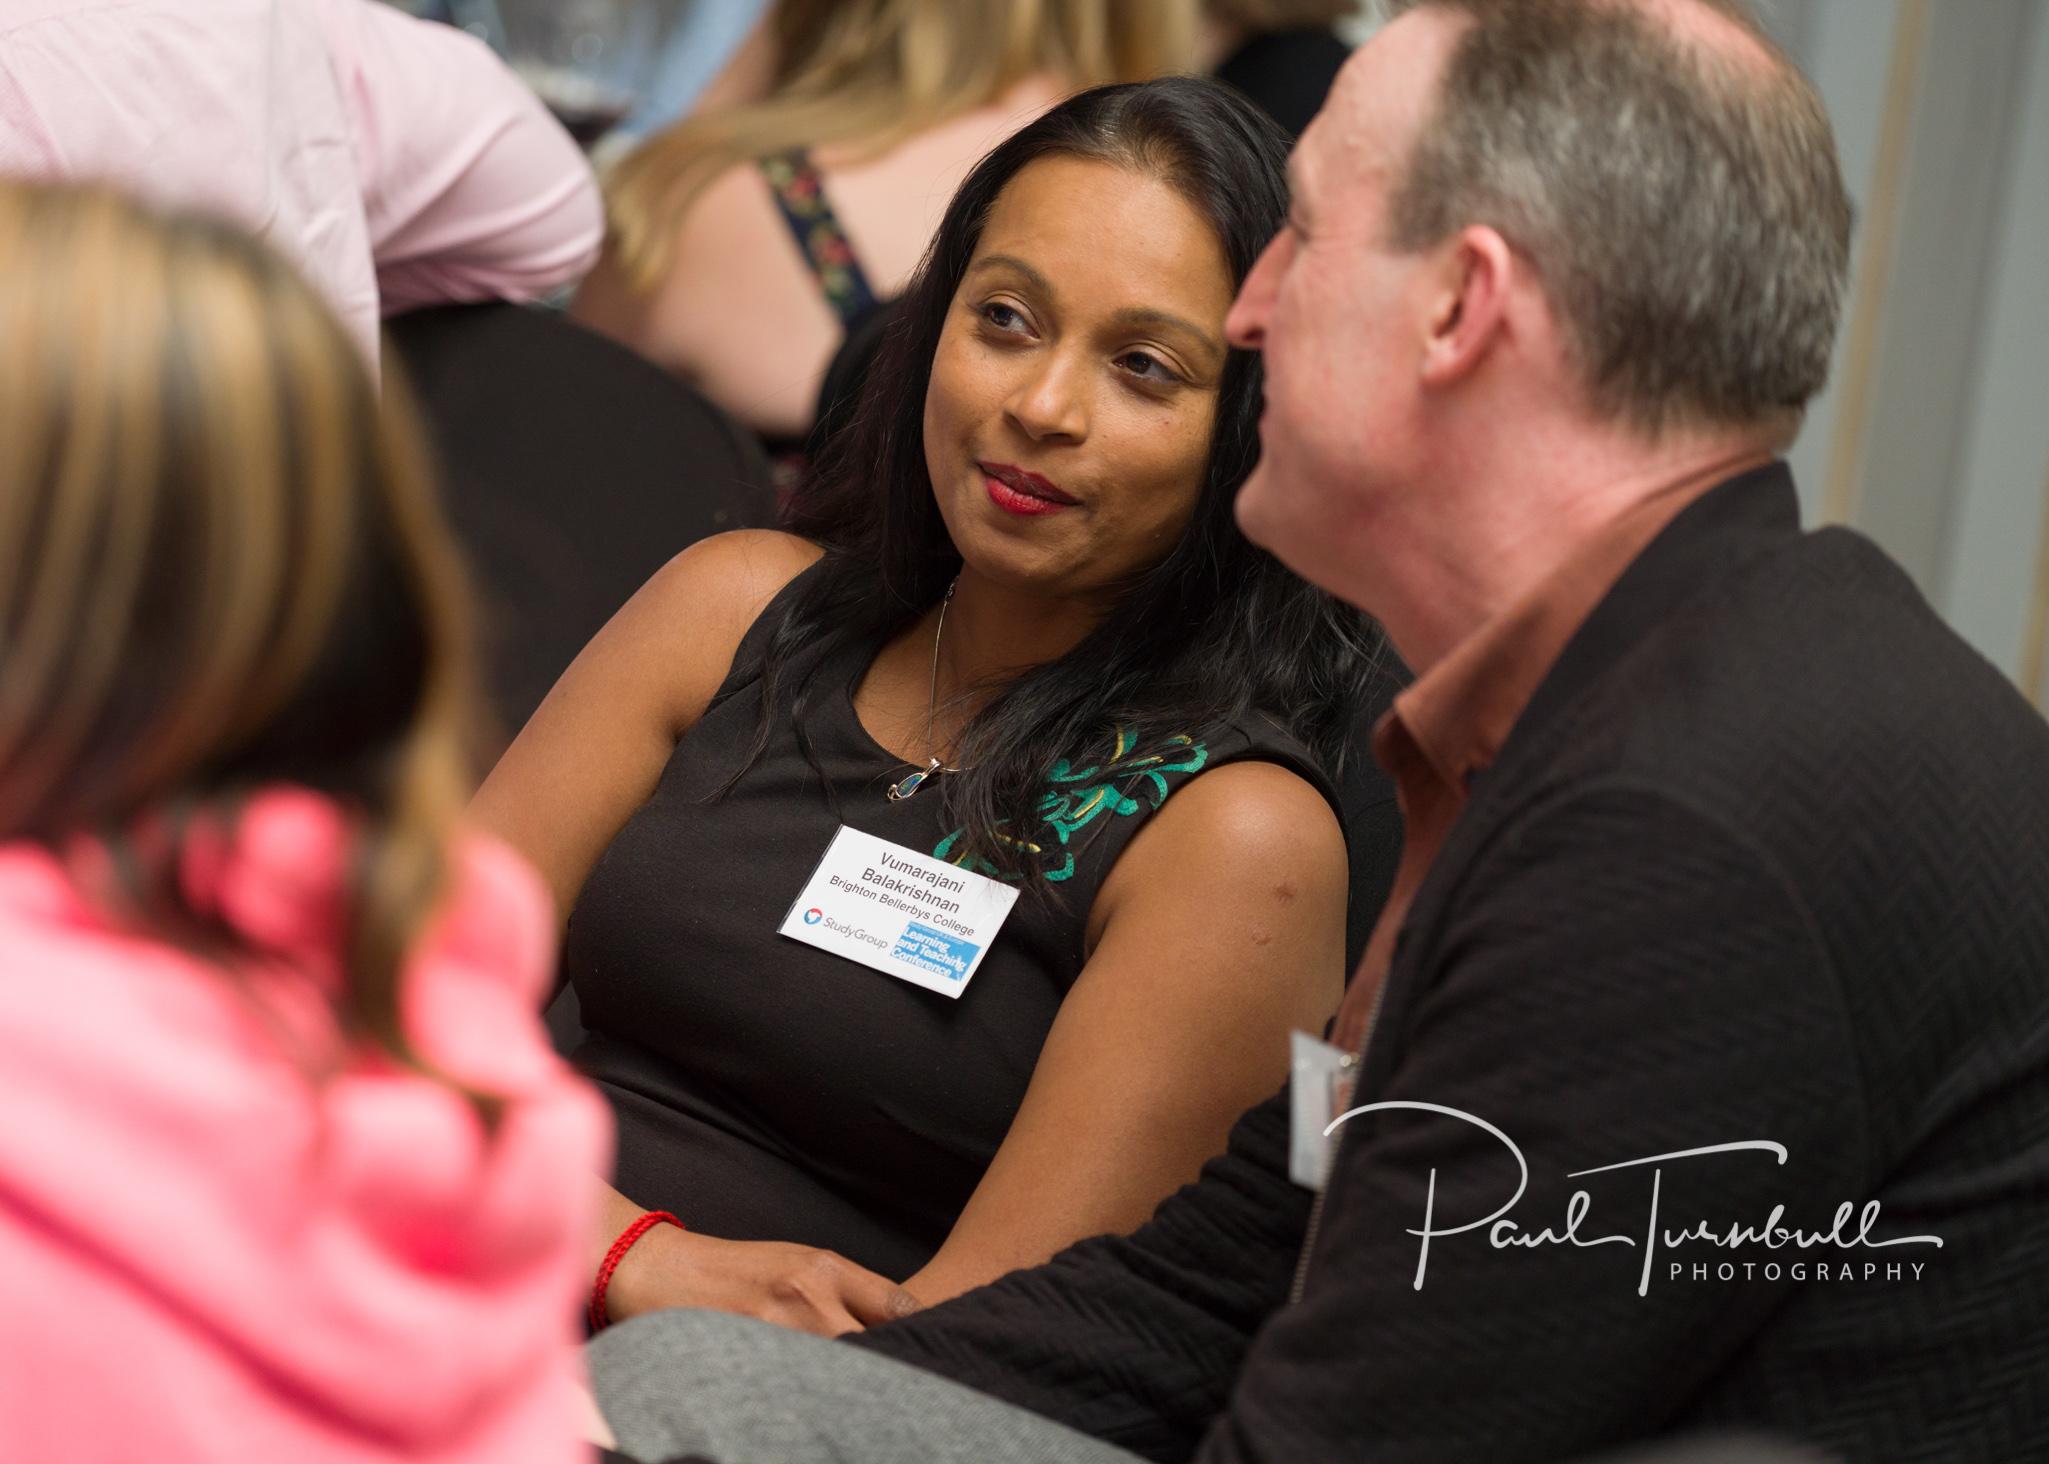 conference-event-photographer-queens-hotel-leeds-yorkshire-034.jpg